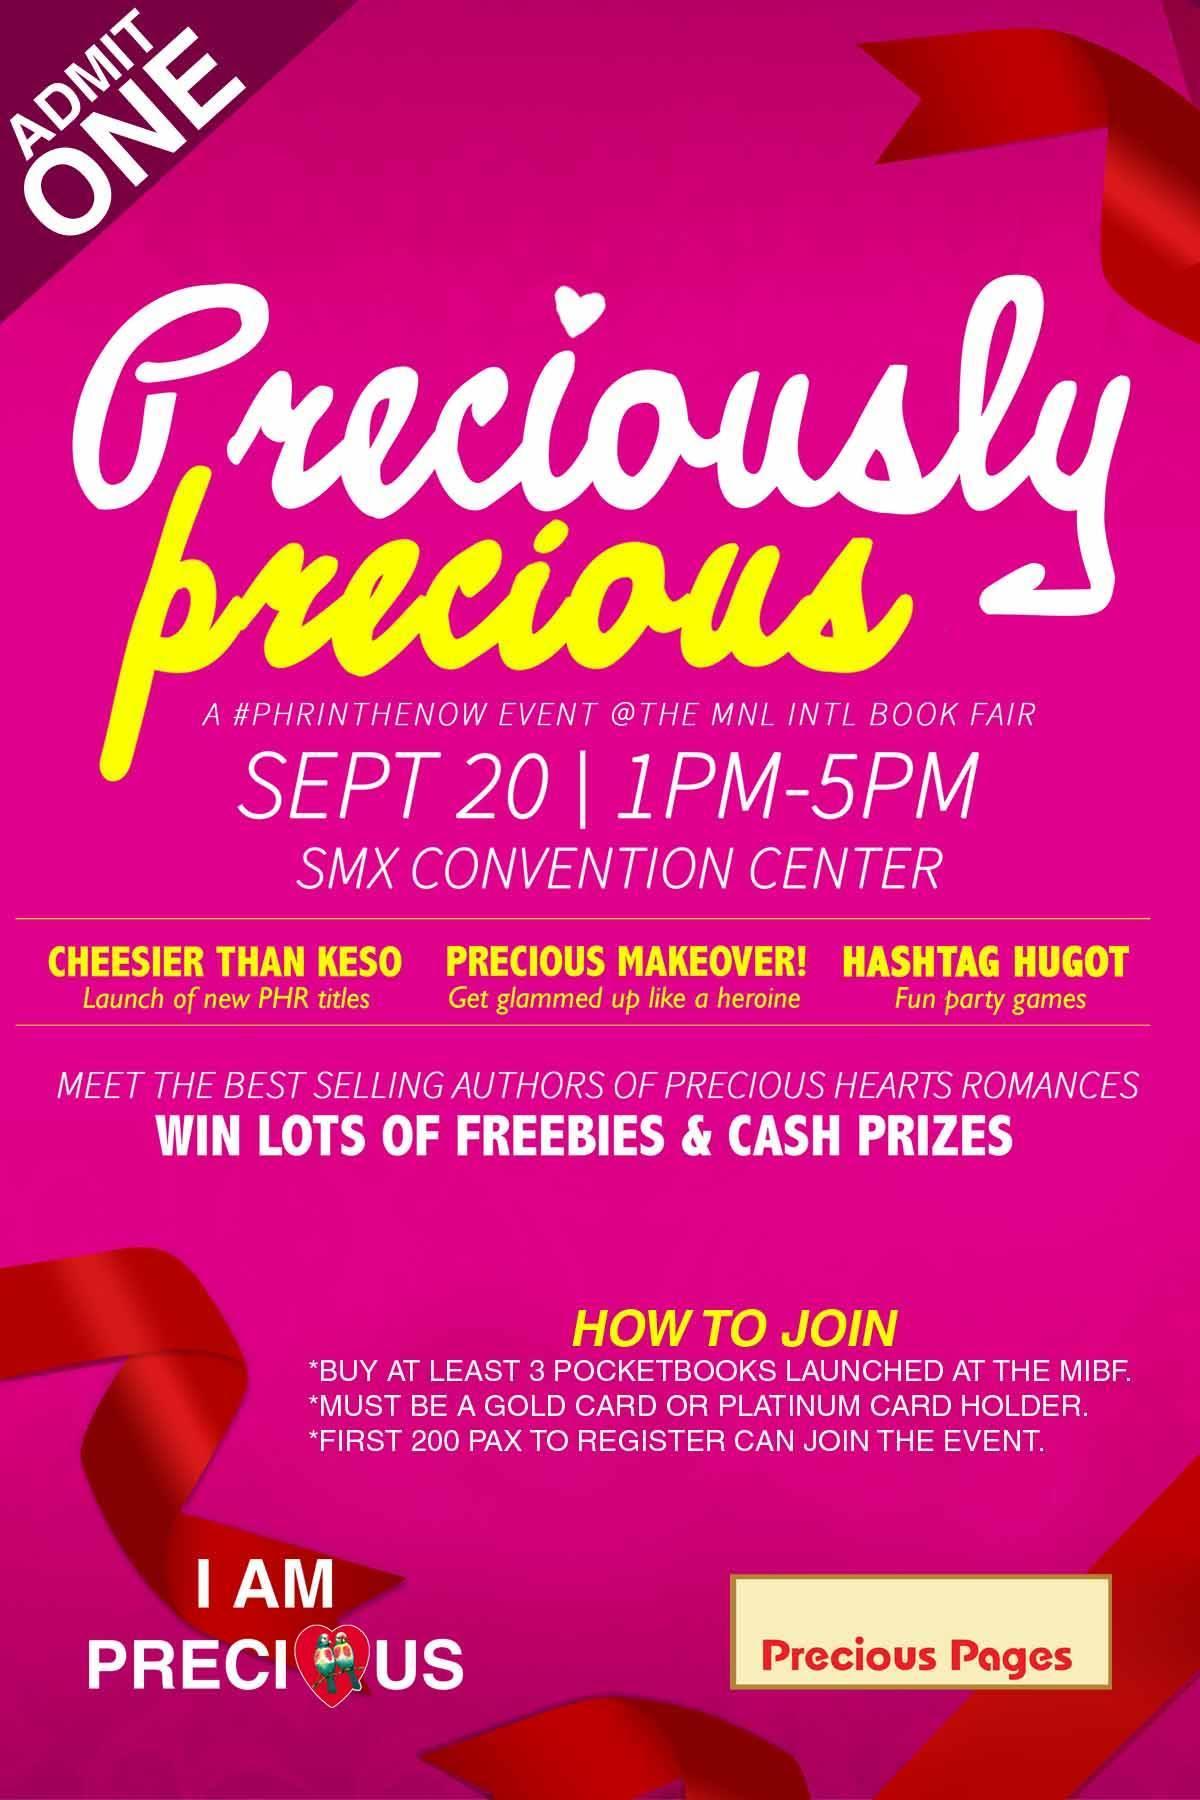 Preciously Precious (An MIBF 2015 Event)